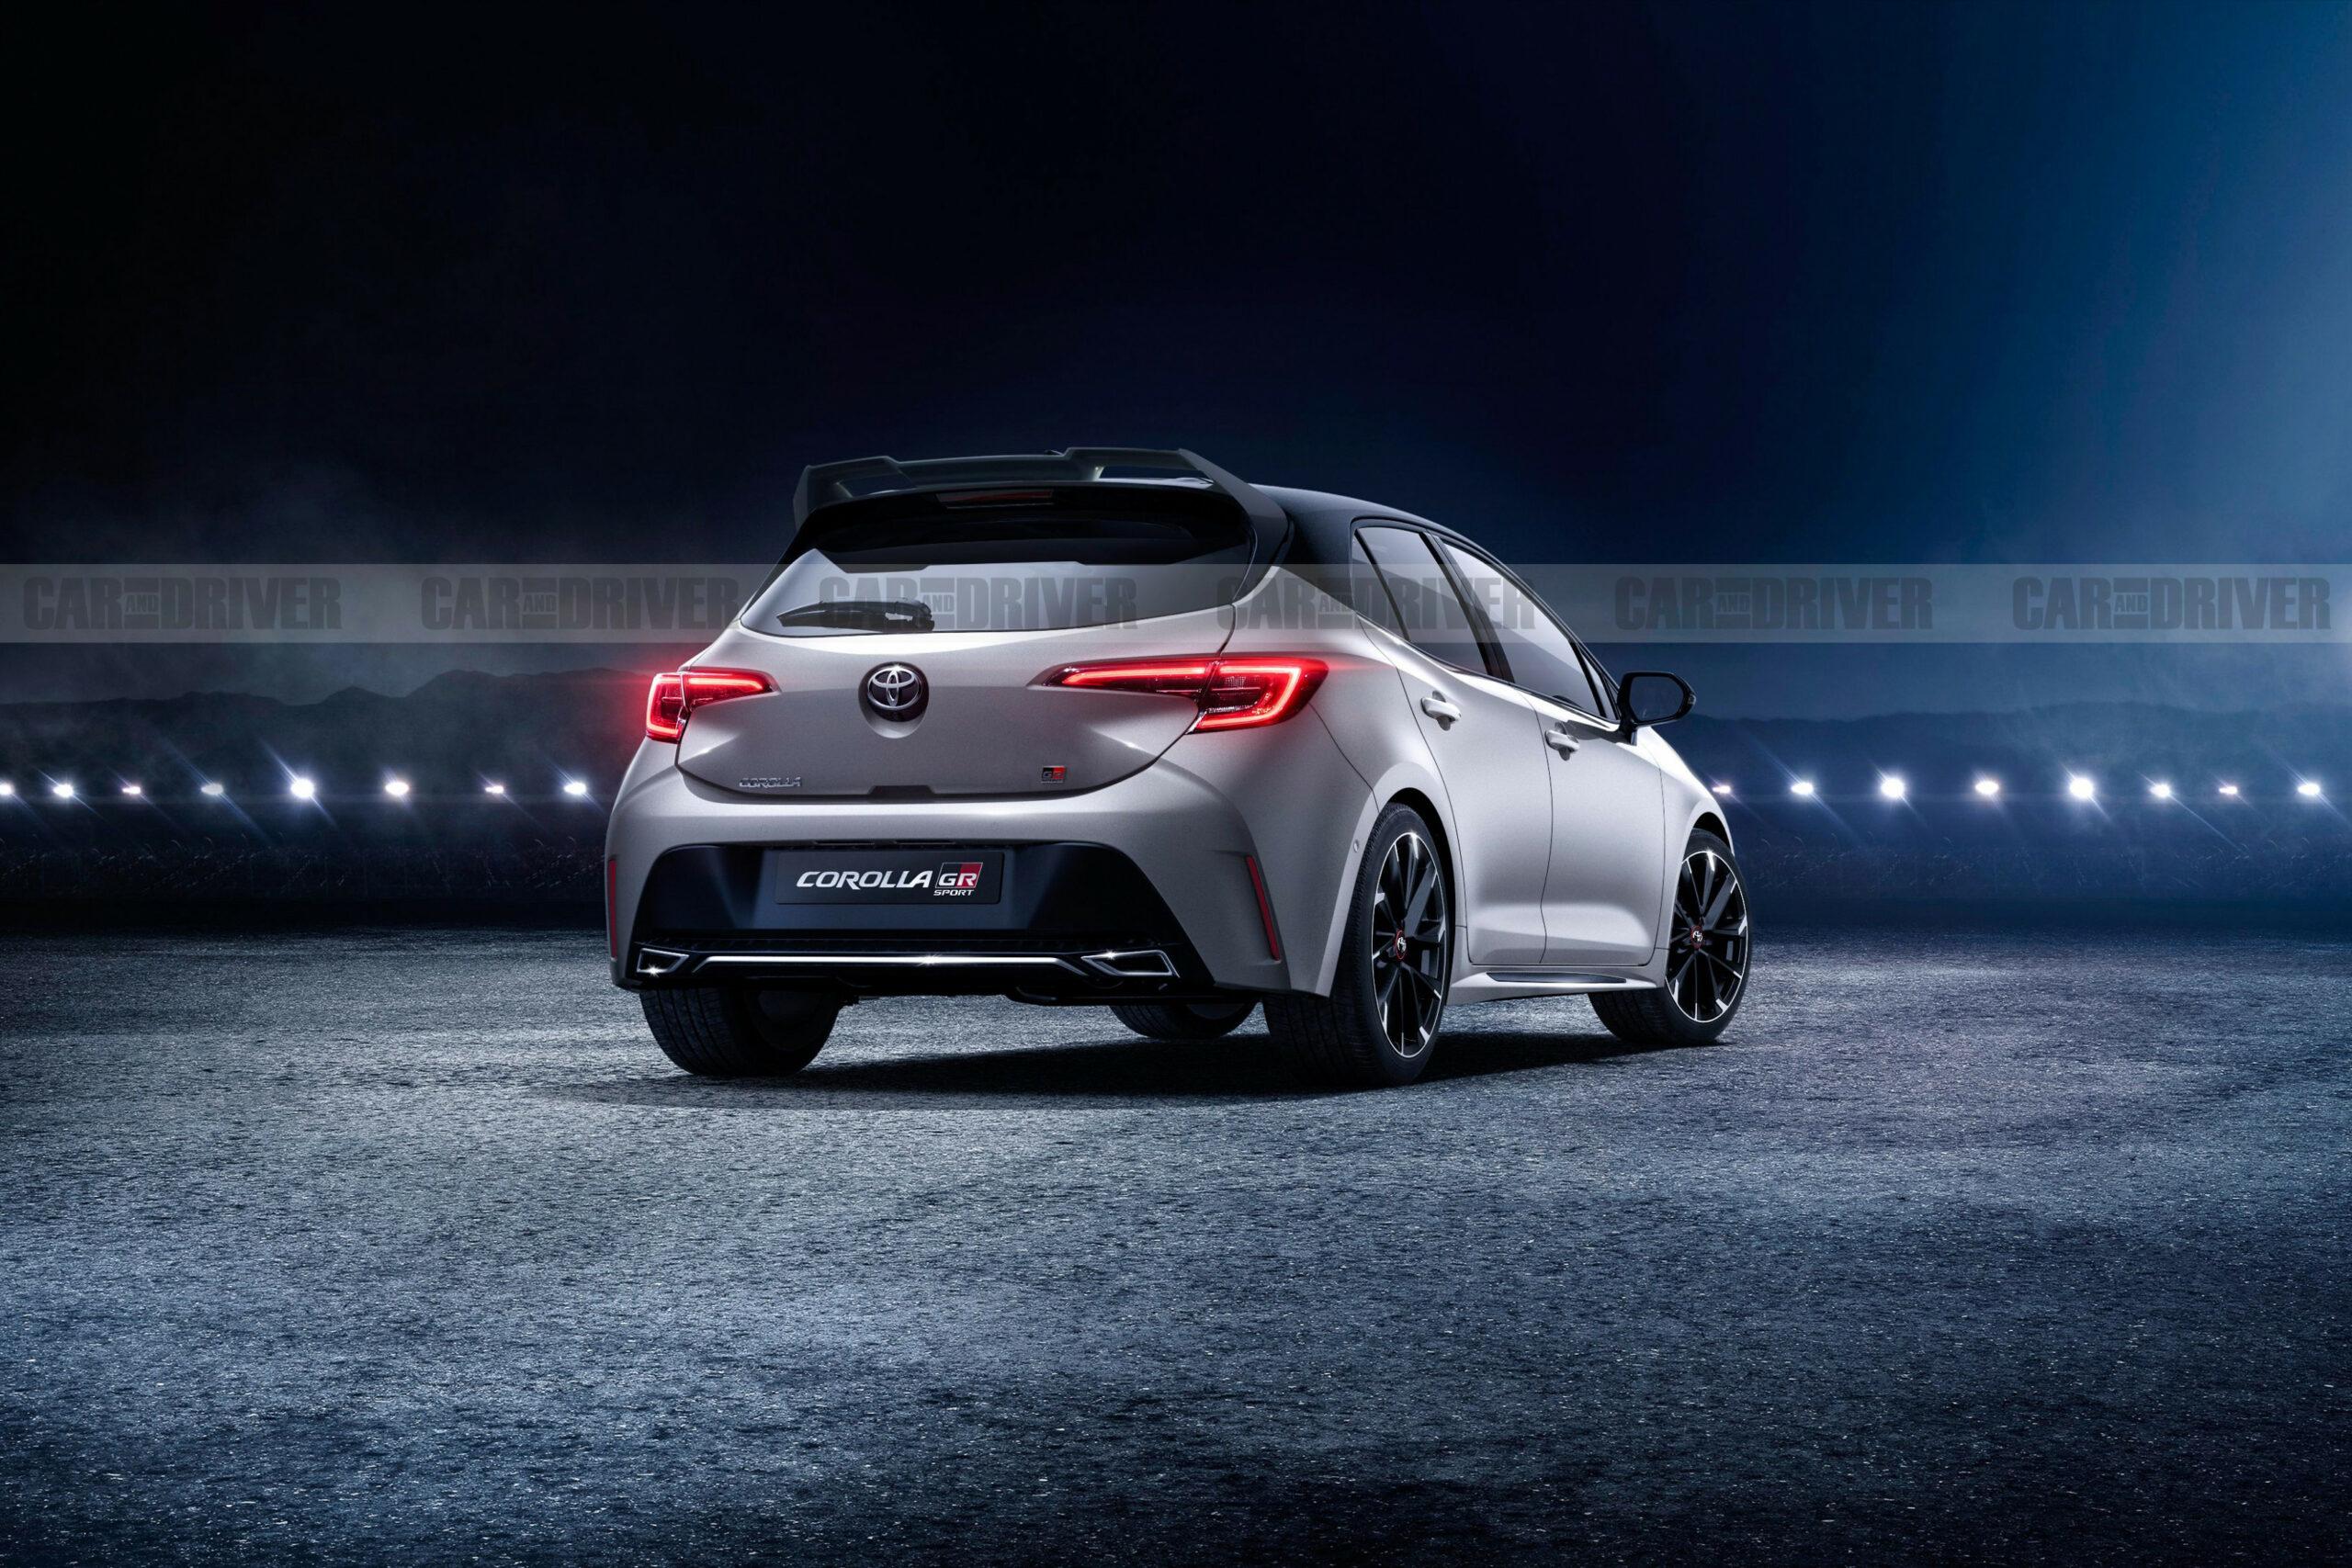 Wallpaper Price Of 2022 Toyota Corolla